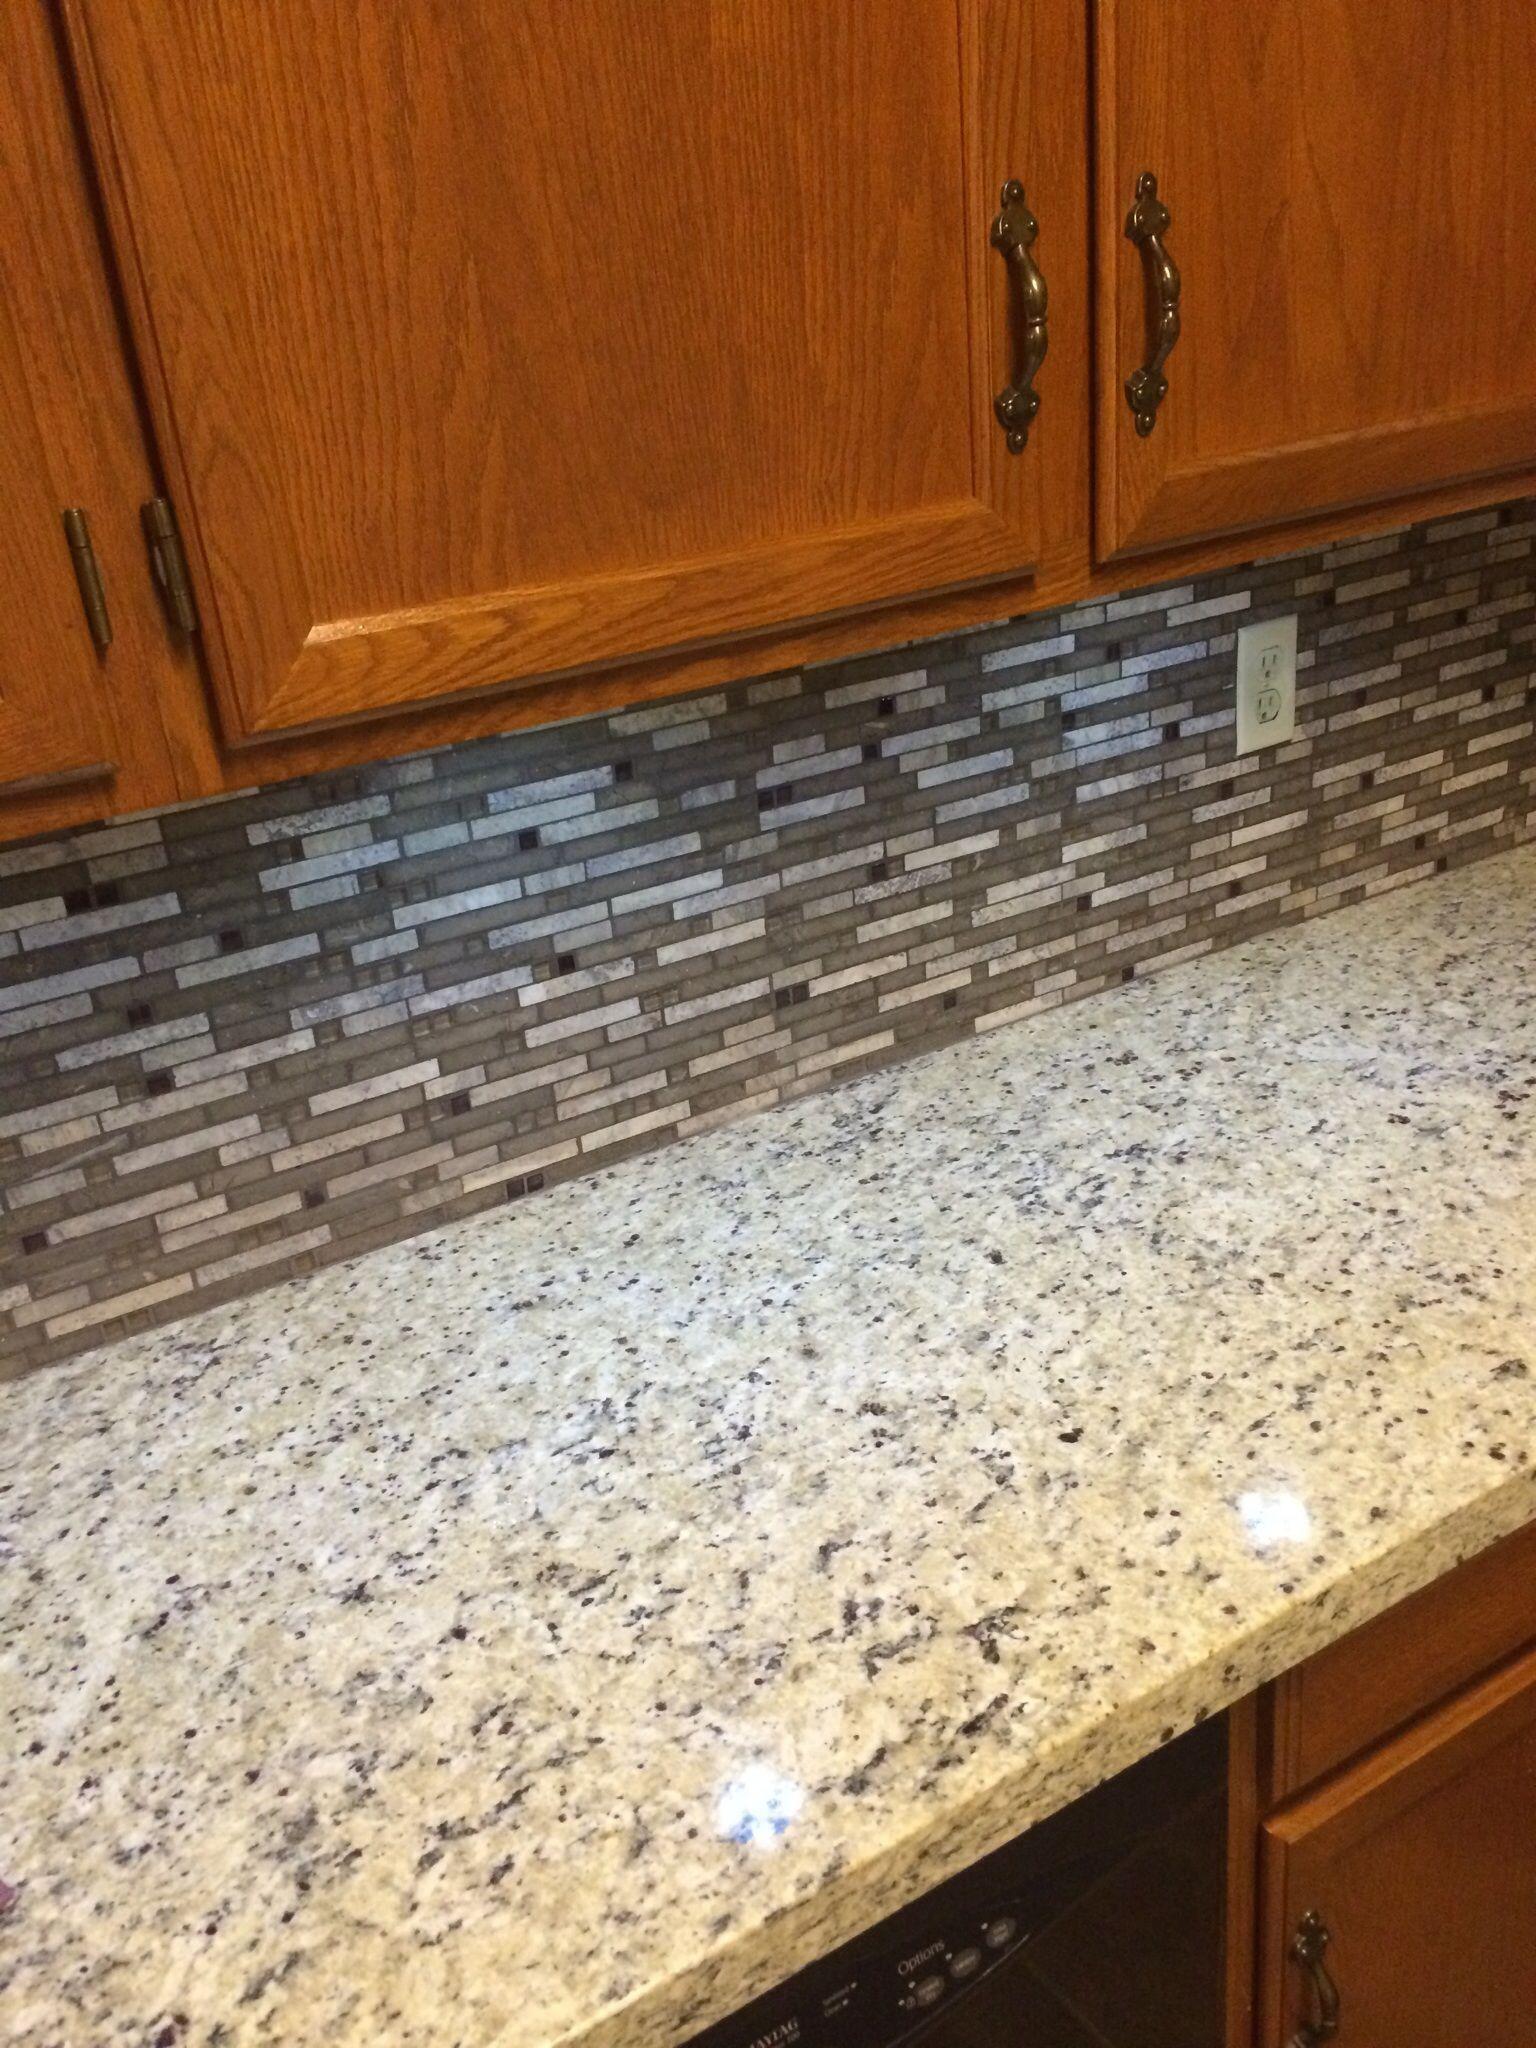 Granite countertops with tile backsplash google search for the home pinterest granite - Backsplash with granite countertops ...